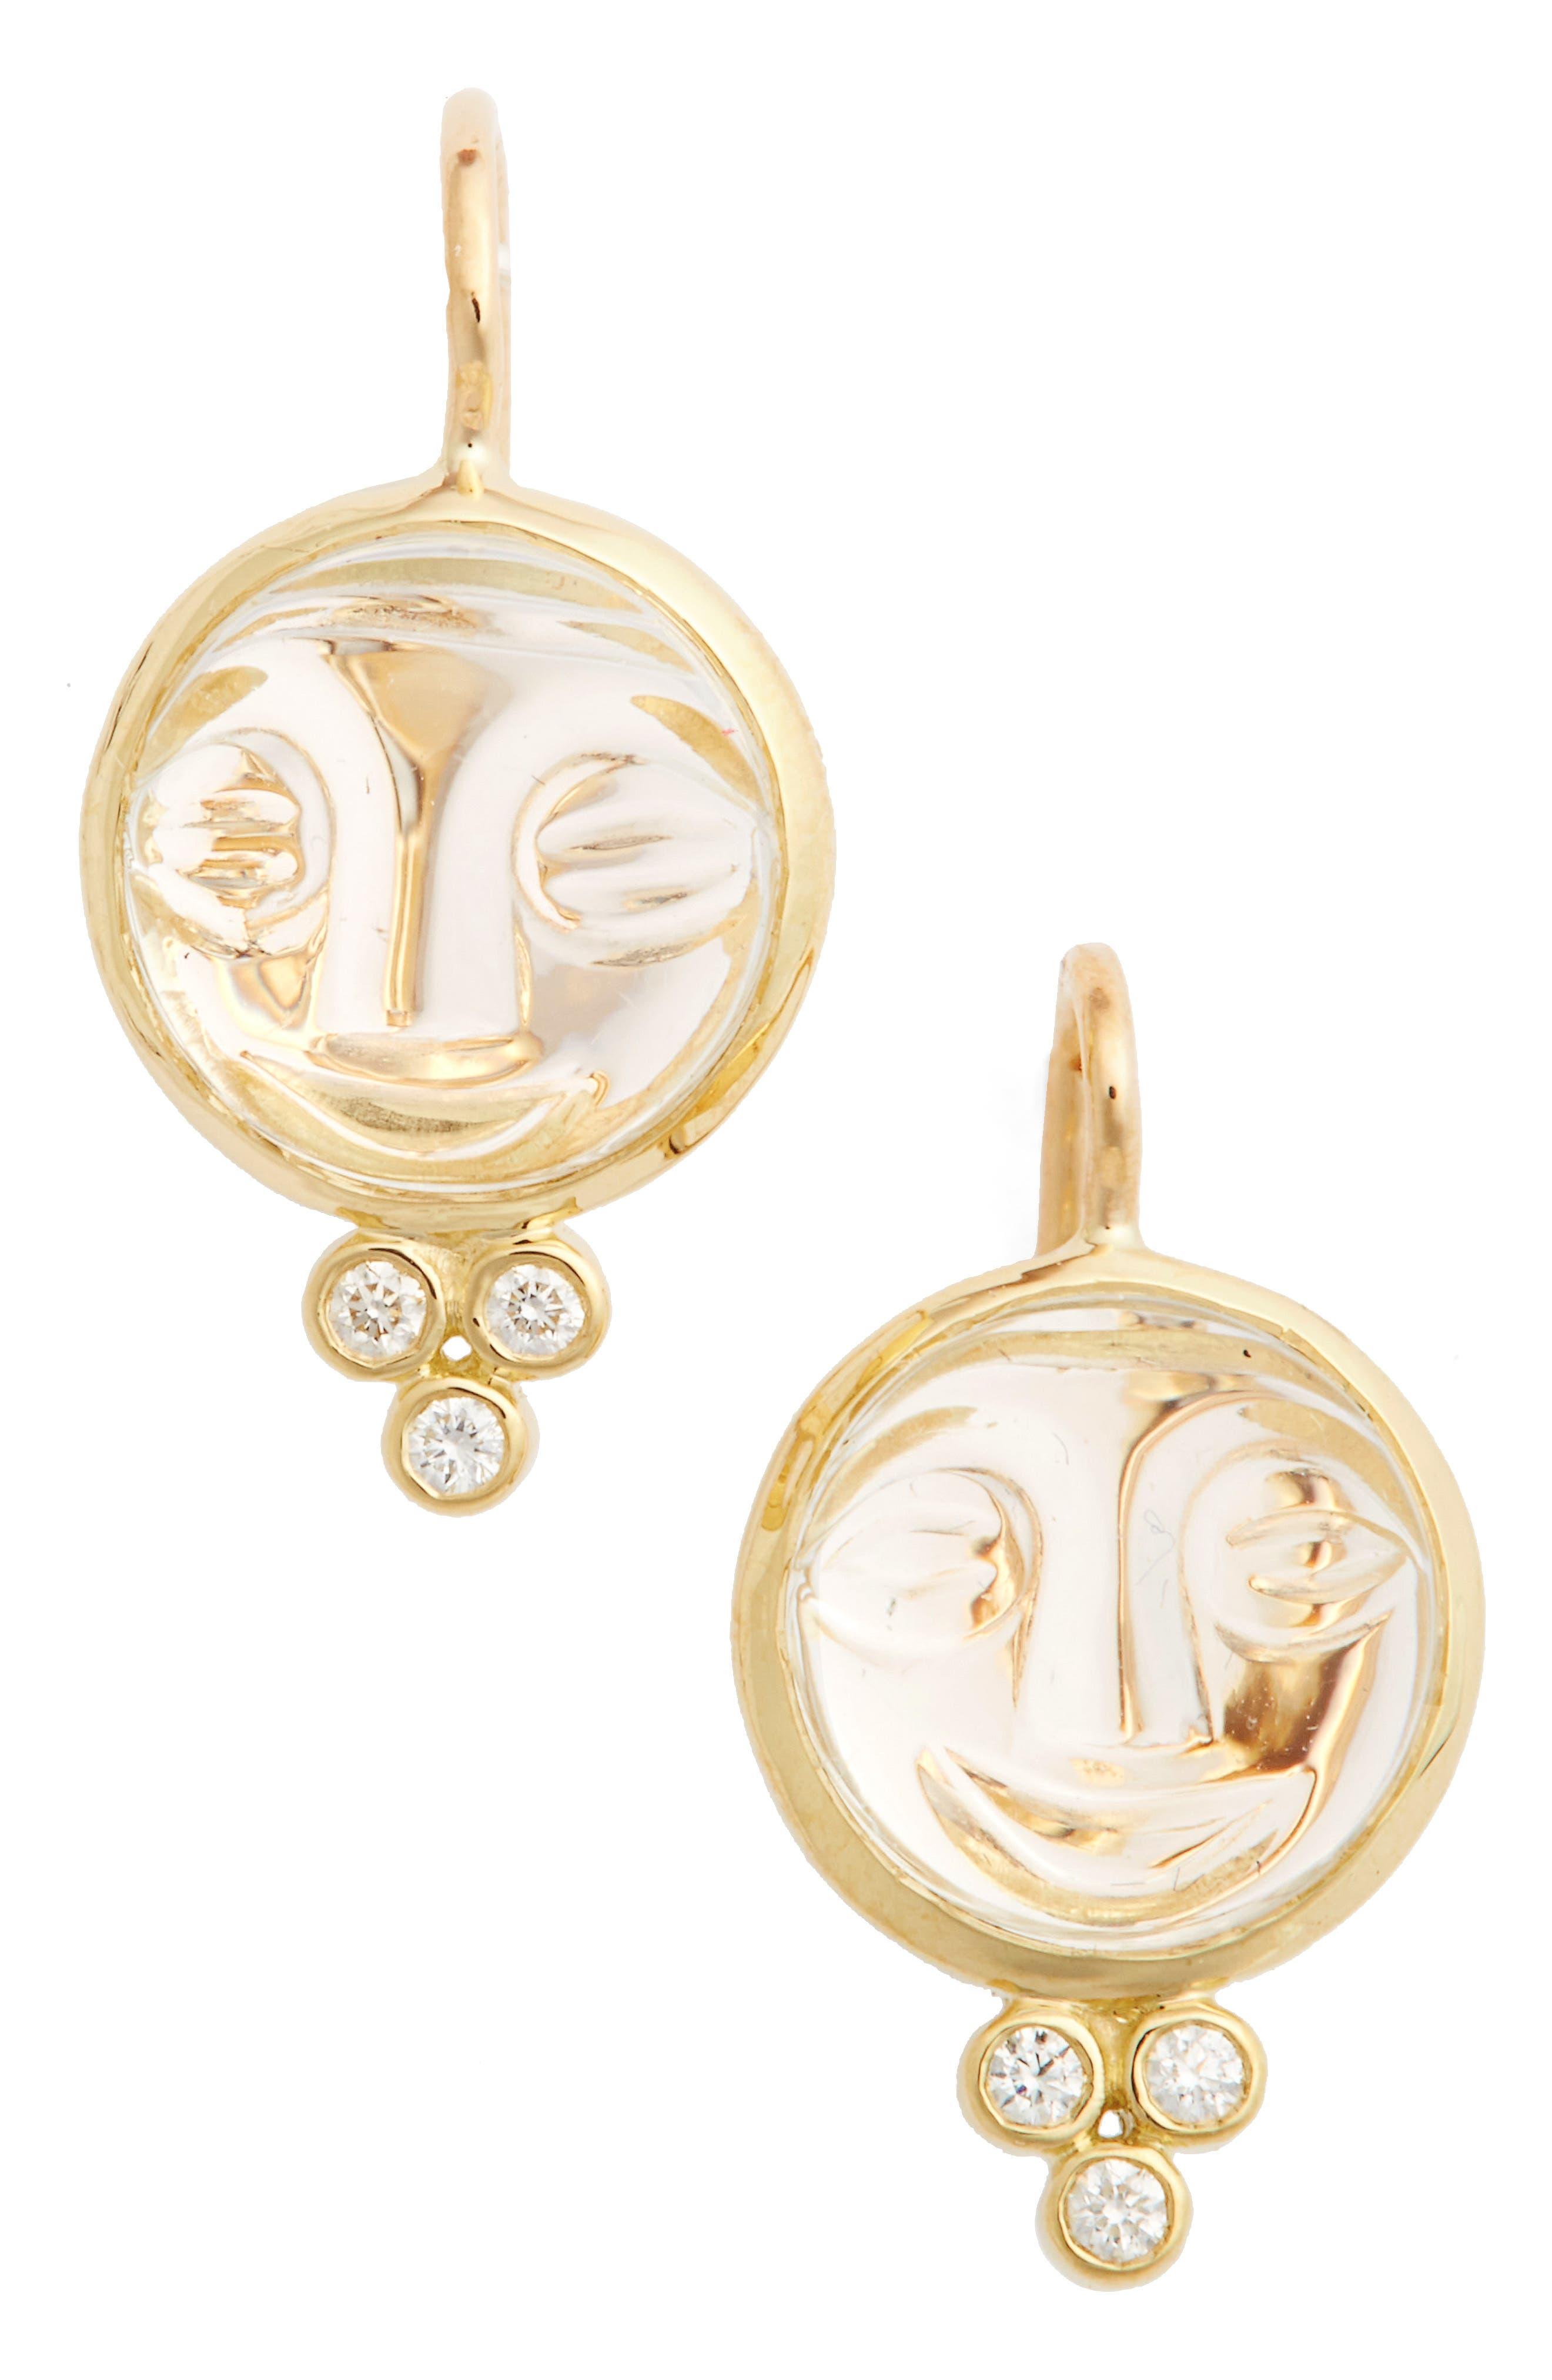 TEMPLE ST CLAIR,                             Temple St. Clair Moonface Diamond & Rock Crystal Earrings,                             Main thumbnail 1, color,                             YELLOW GOLD/ CRYSTAL